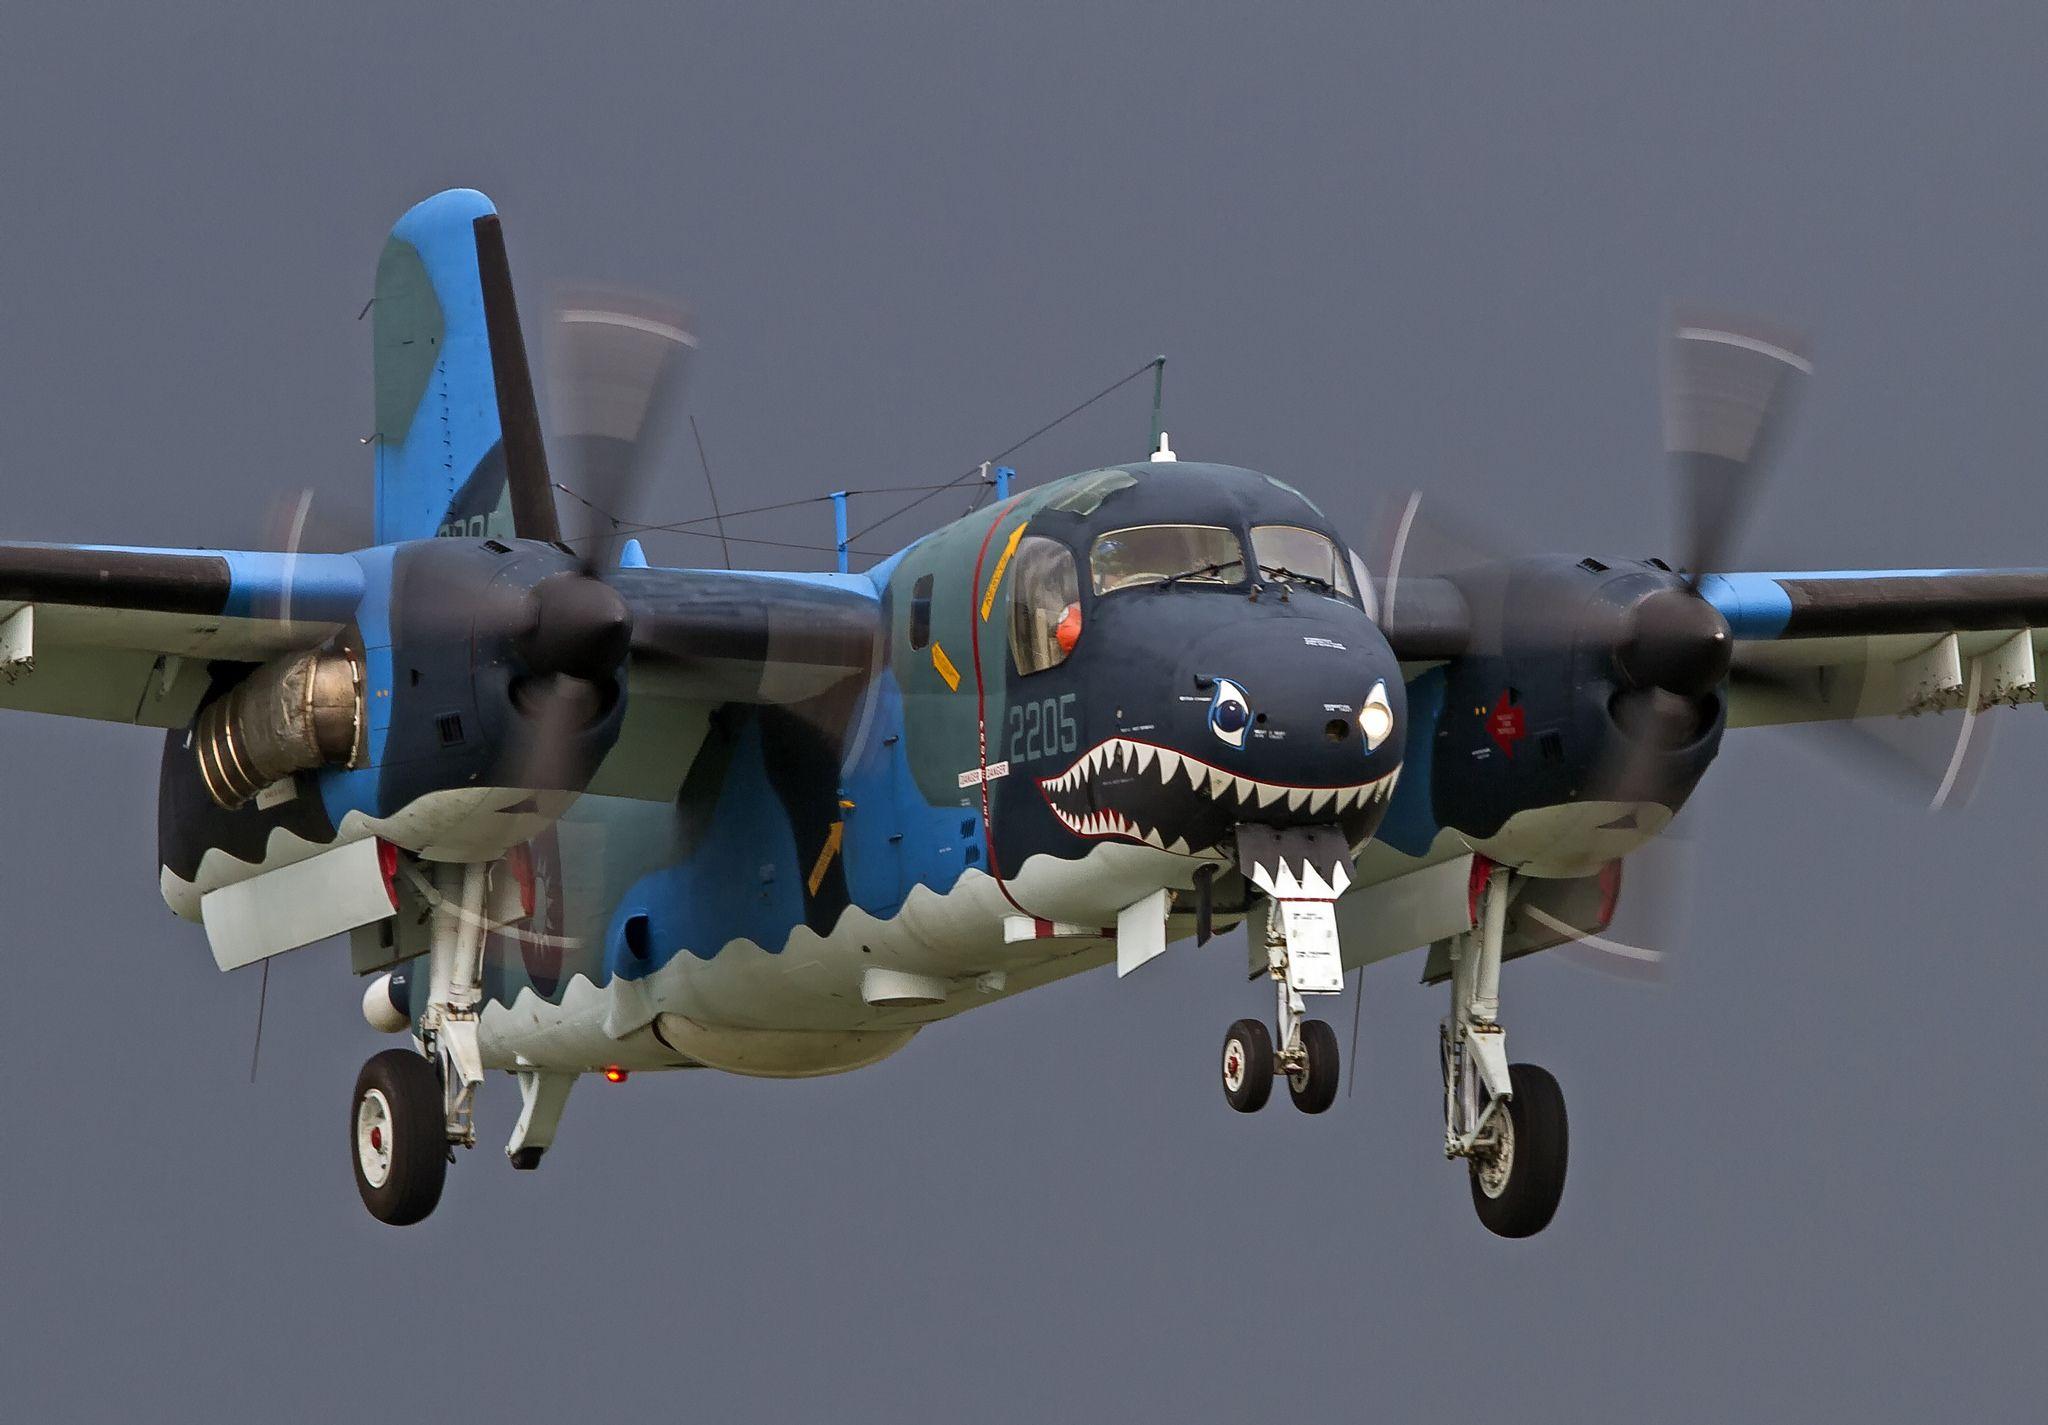 Grumman S 2t Tracker Military Aircraft Model Aircraft Aircraft